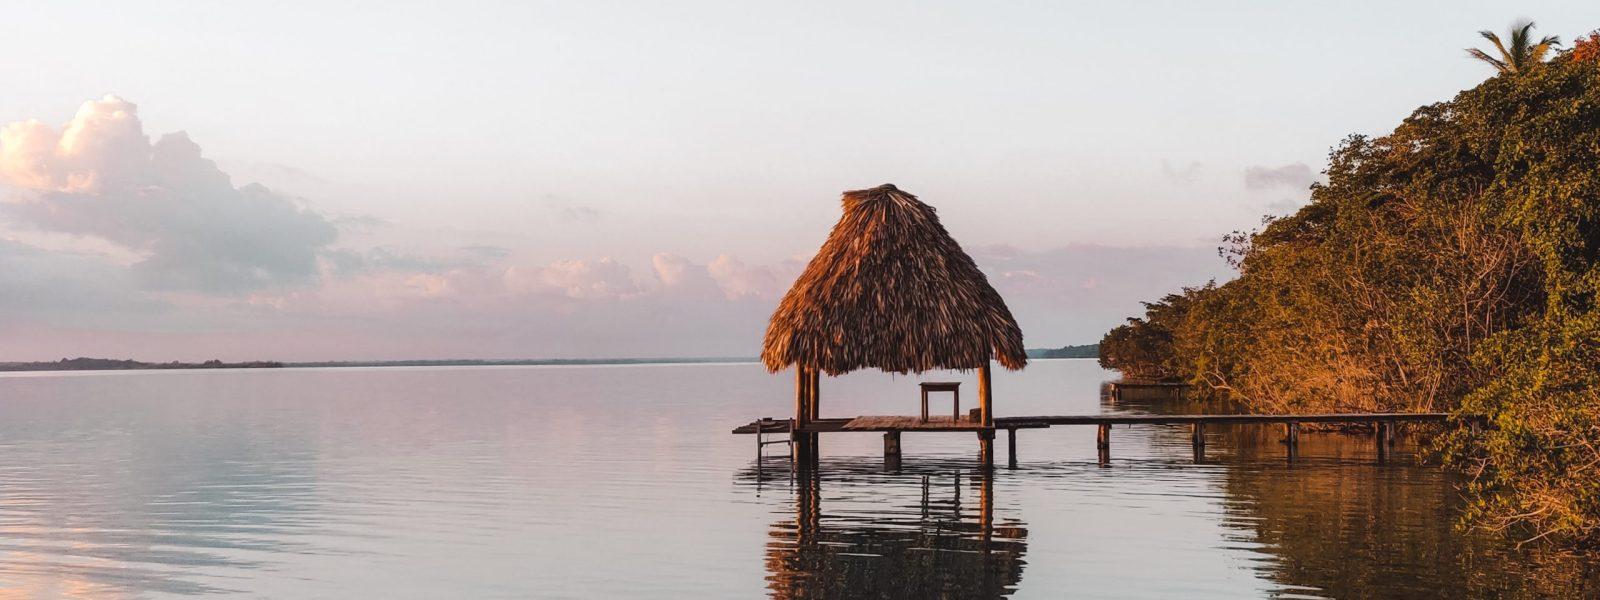 Airbnb Bacalar: unique lakeside ecocabanas